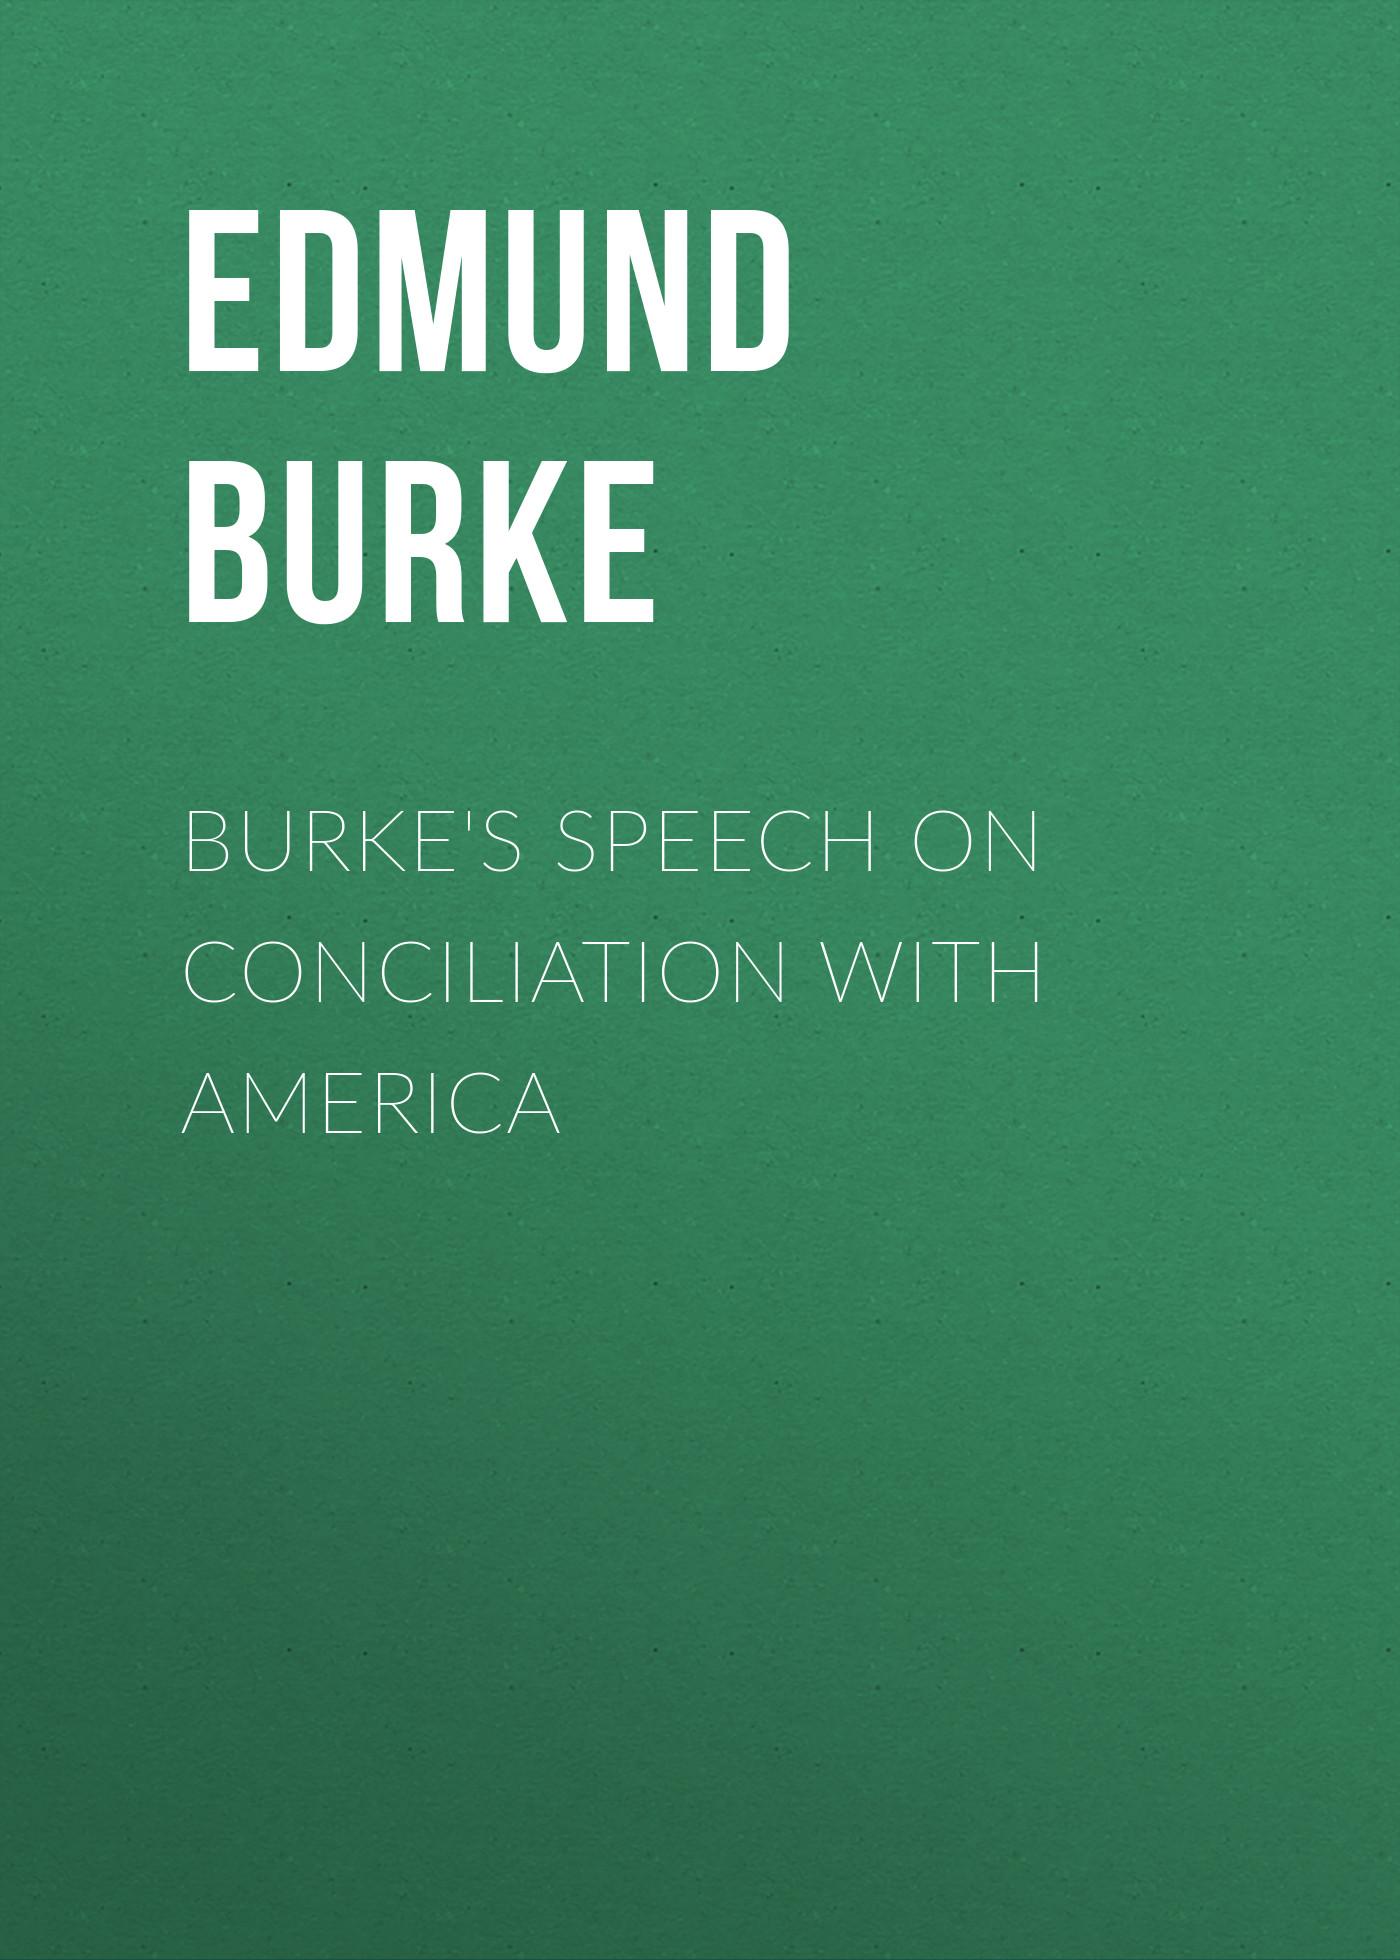 Edmund Burke Burke's Speech on Conciliation with America alexandra burke westcliff on sea